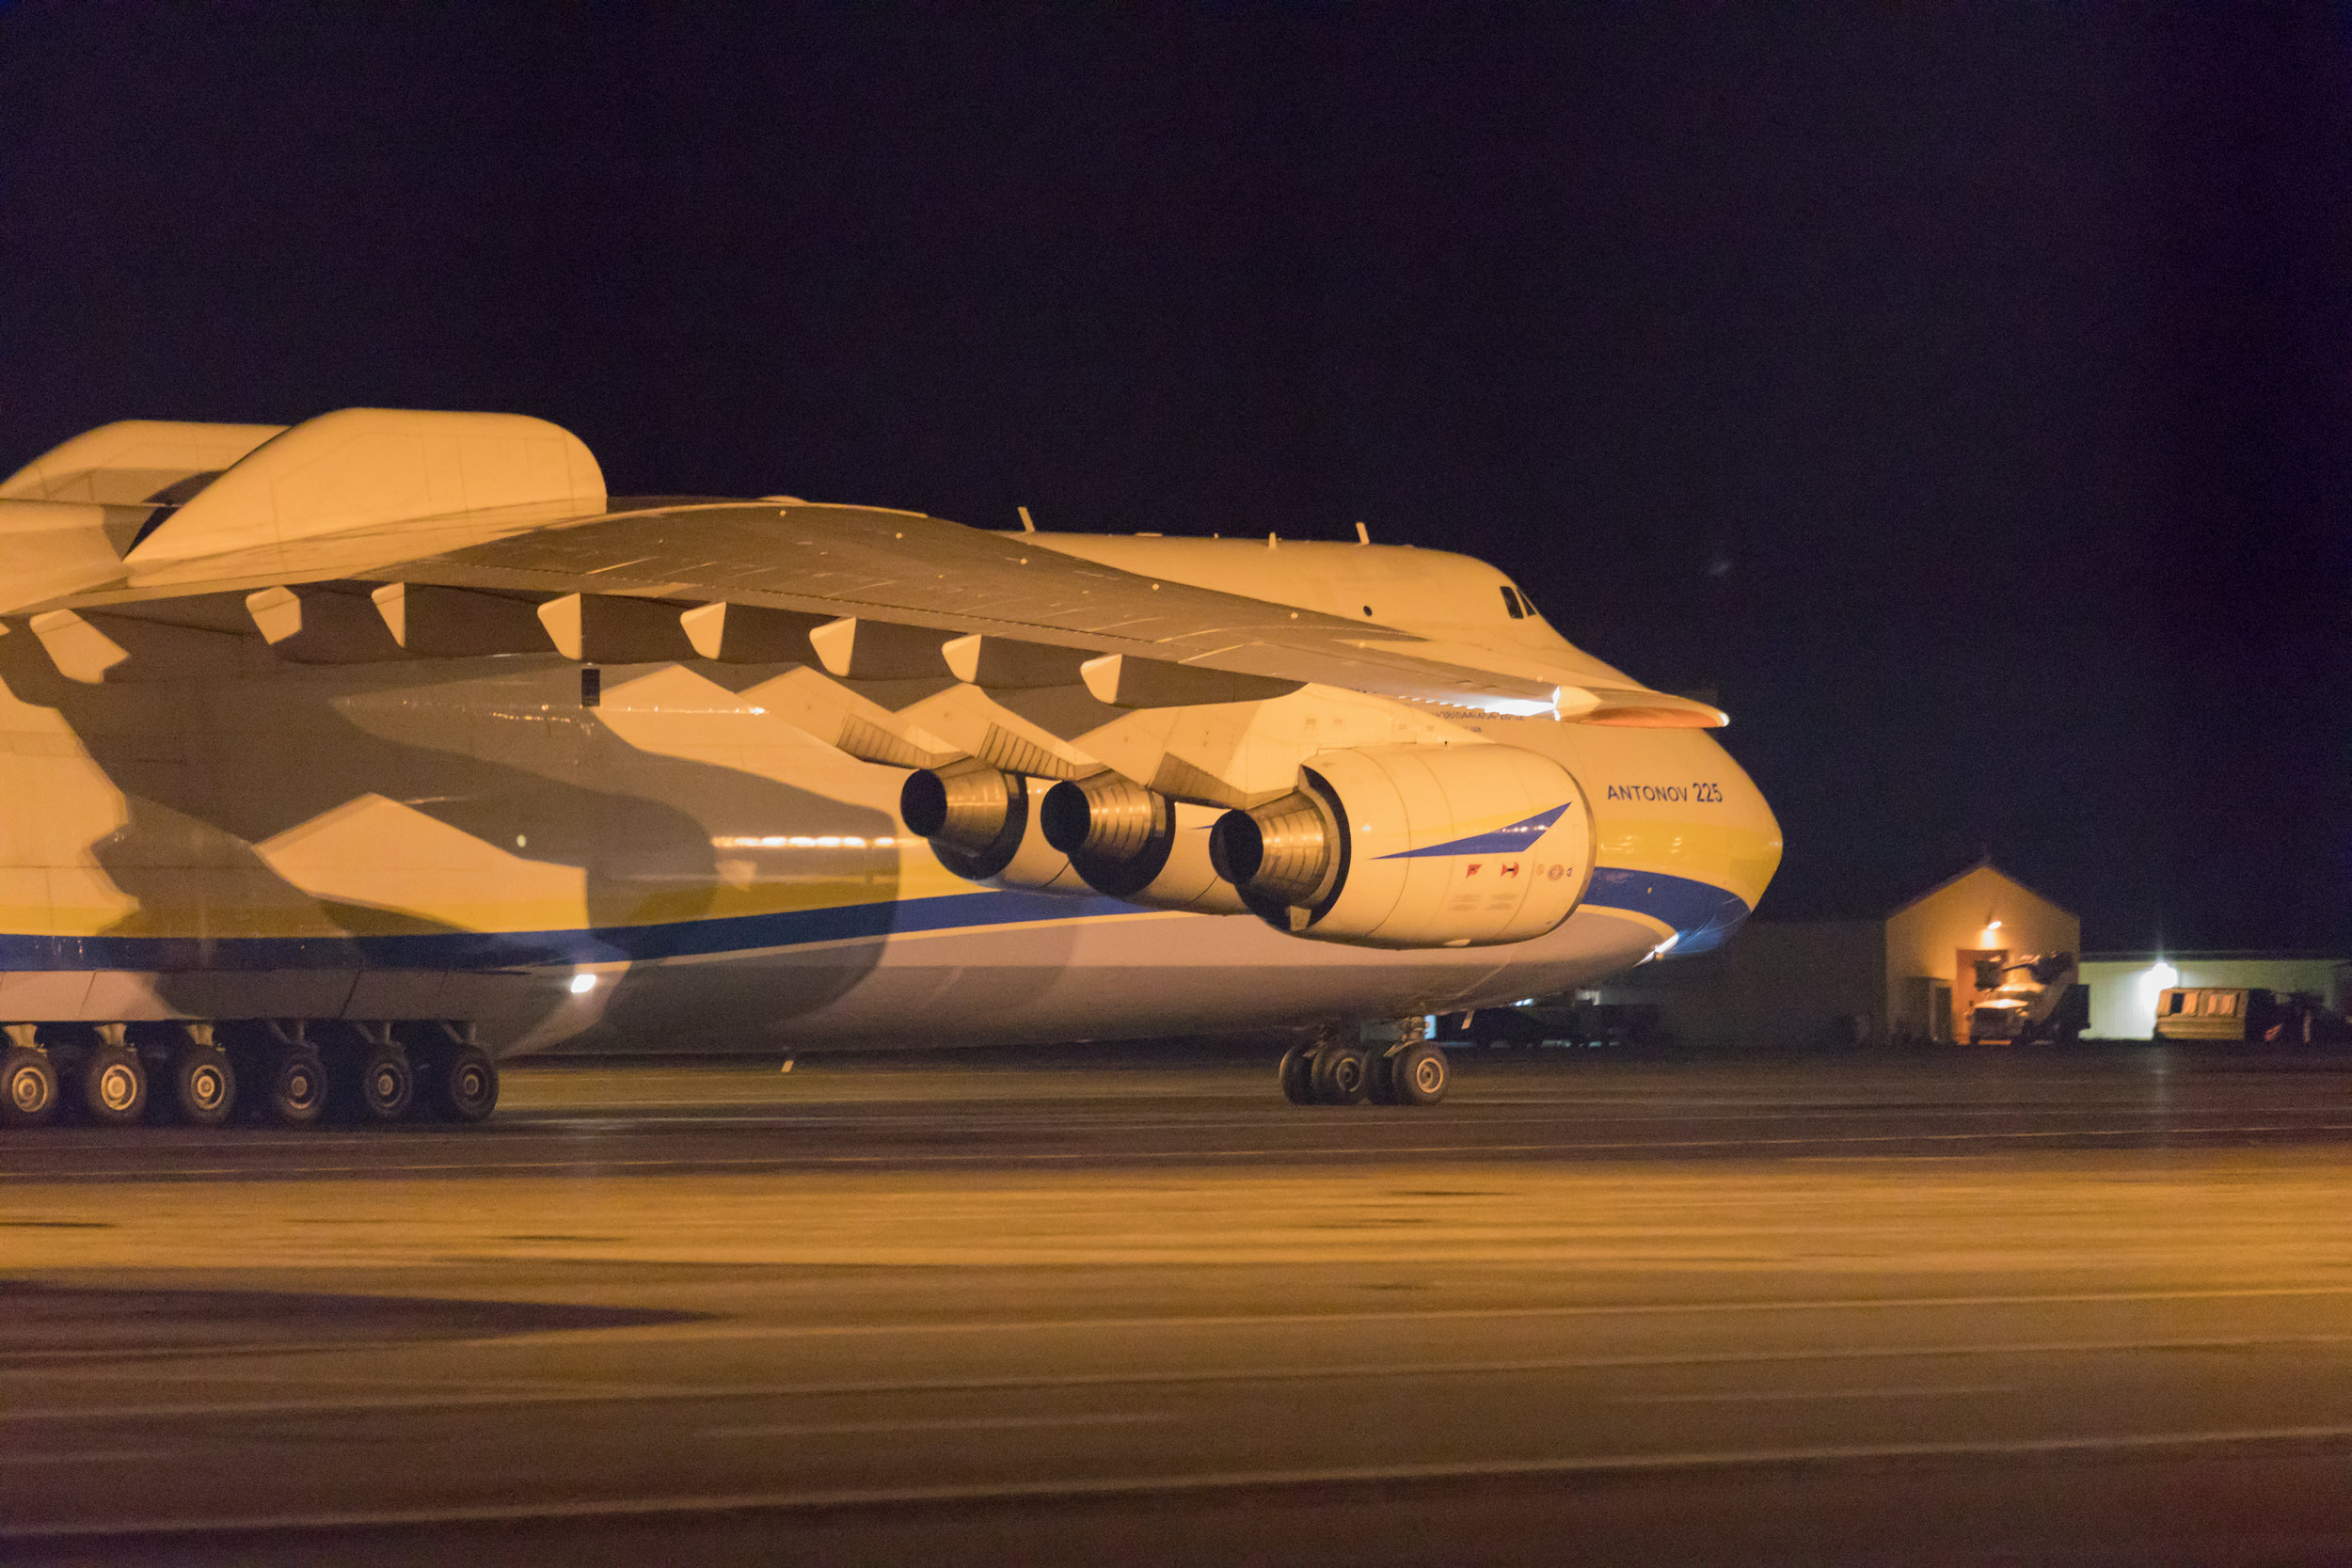 Mriya on the way for refueling